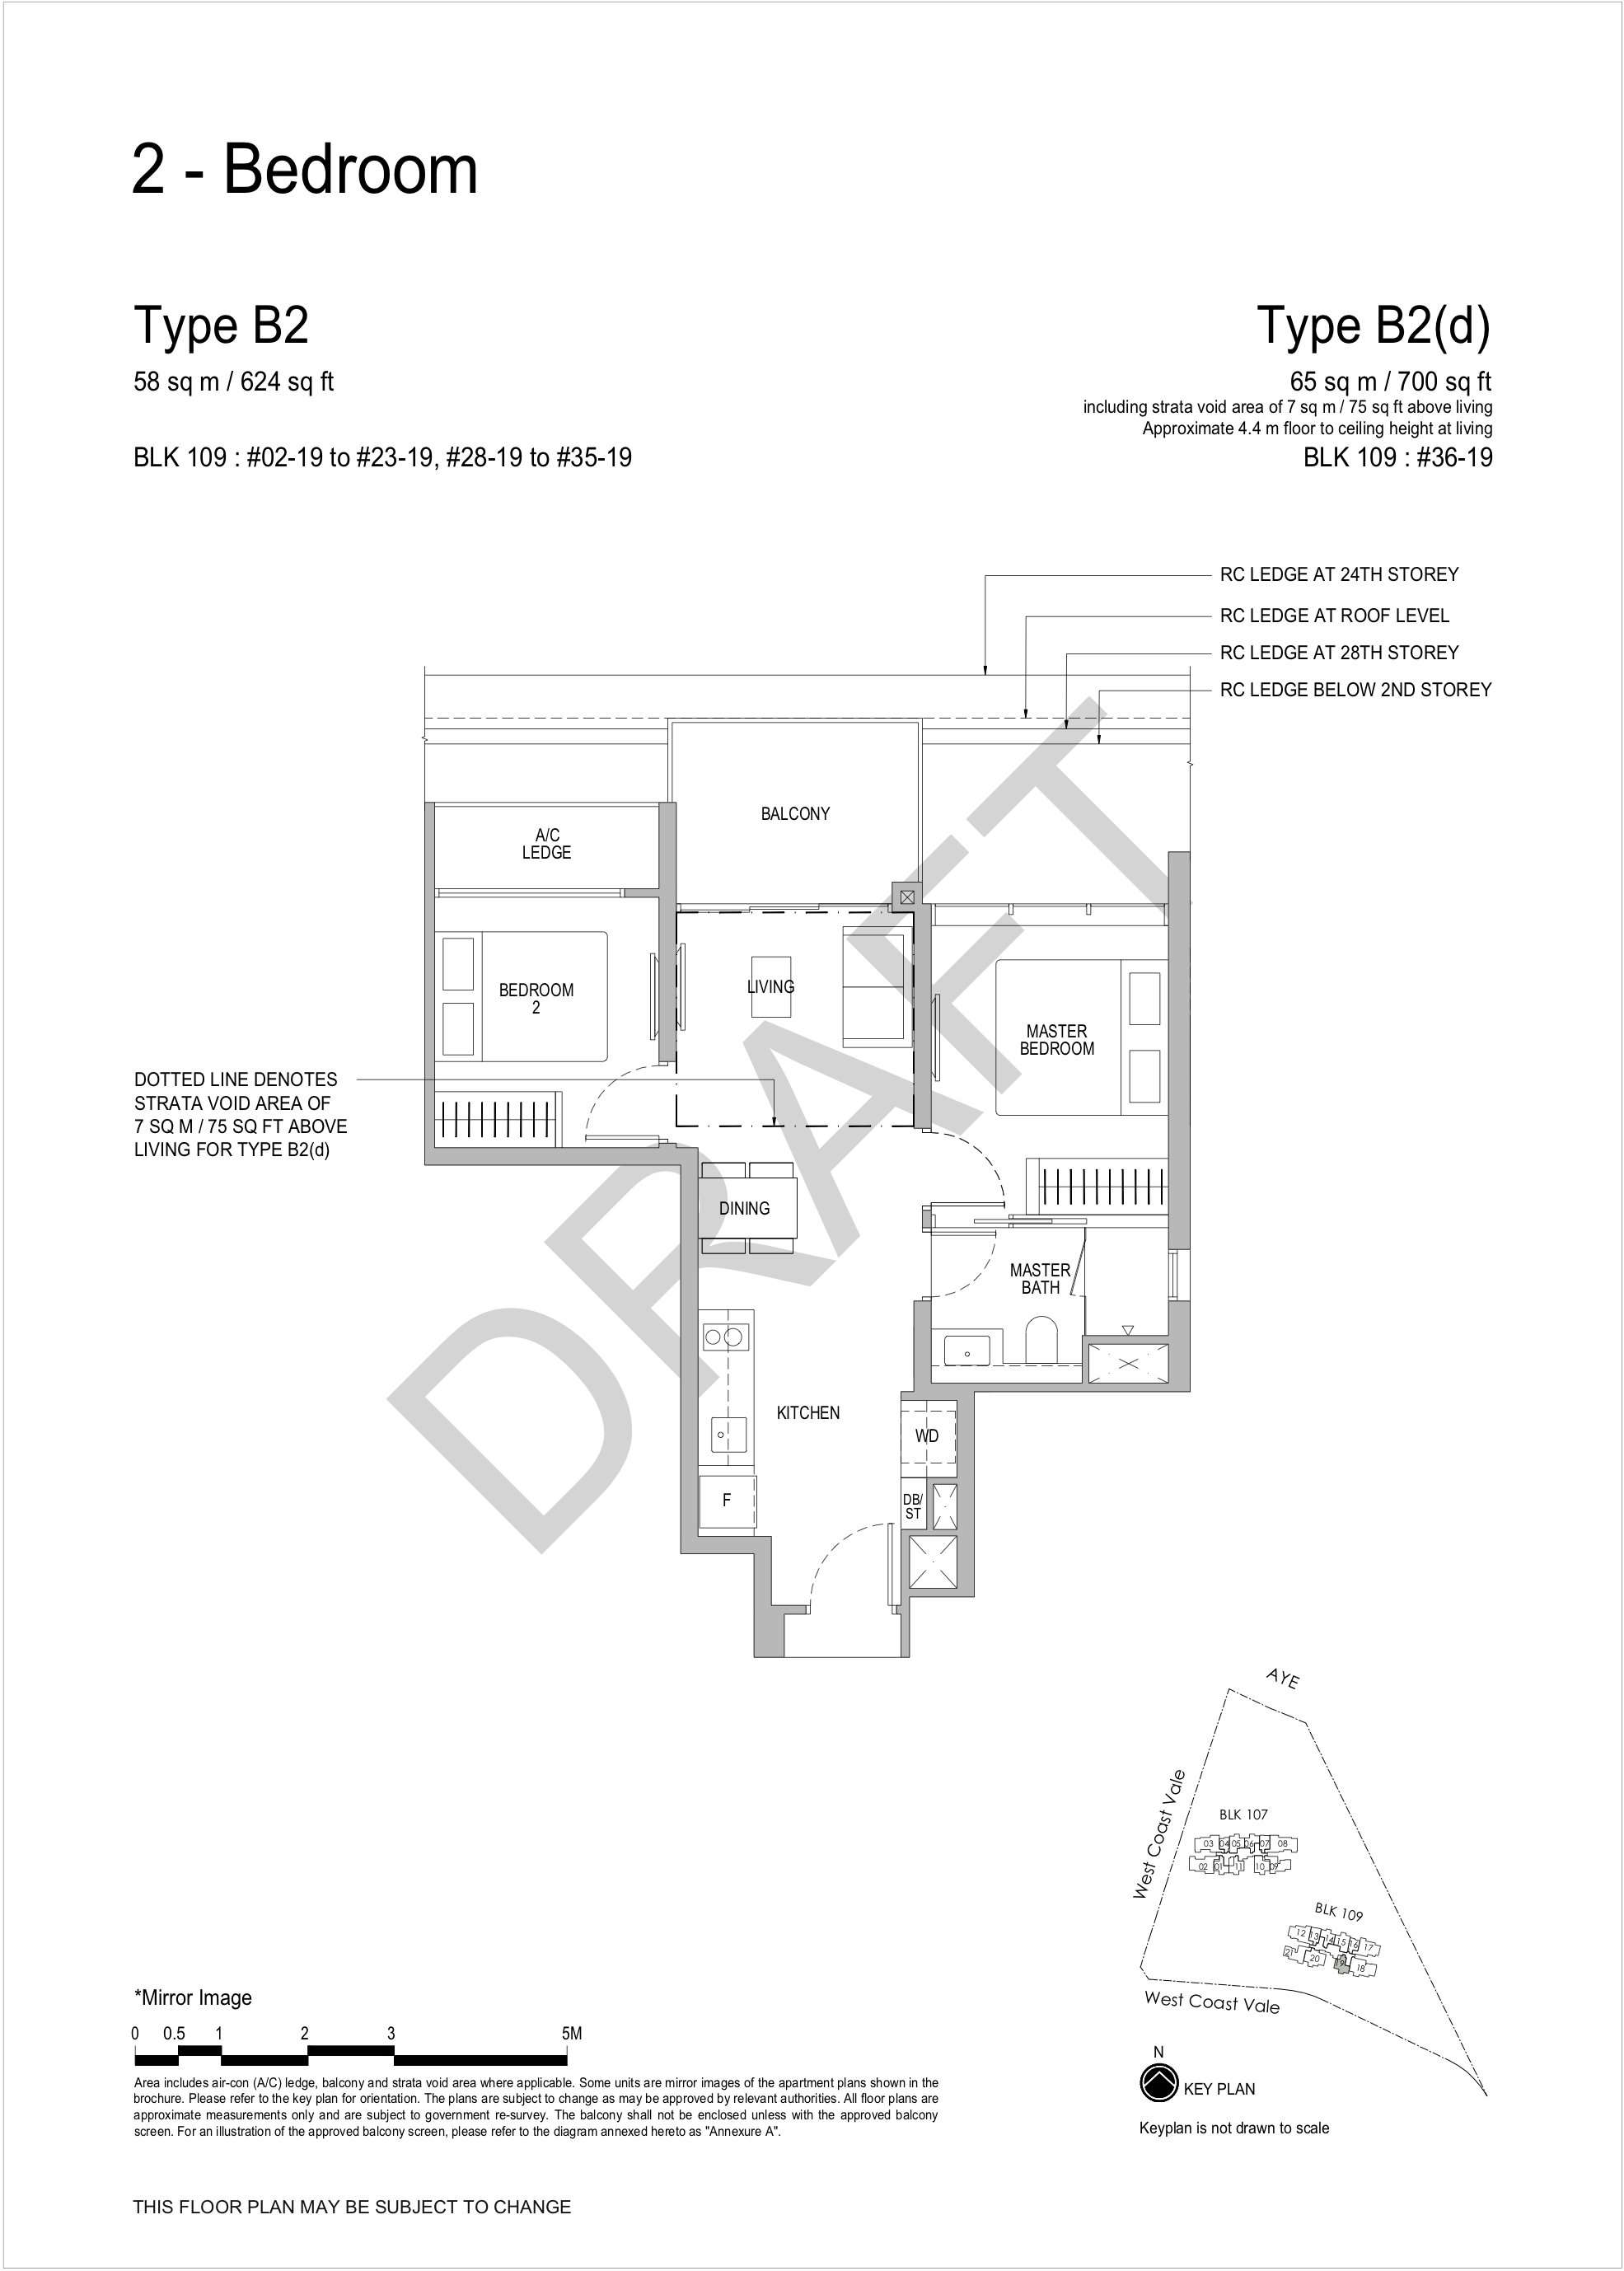 Whistler Grand 2 bedroom floor plan B2